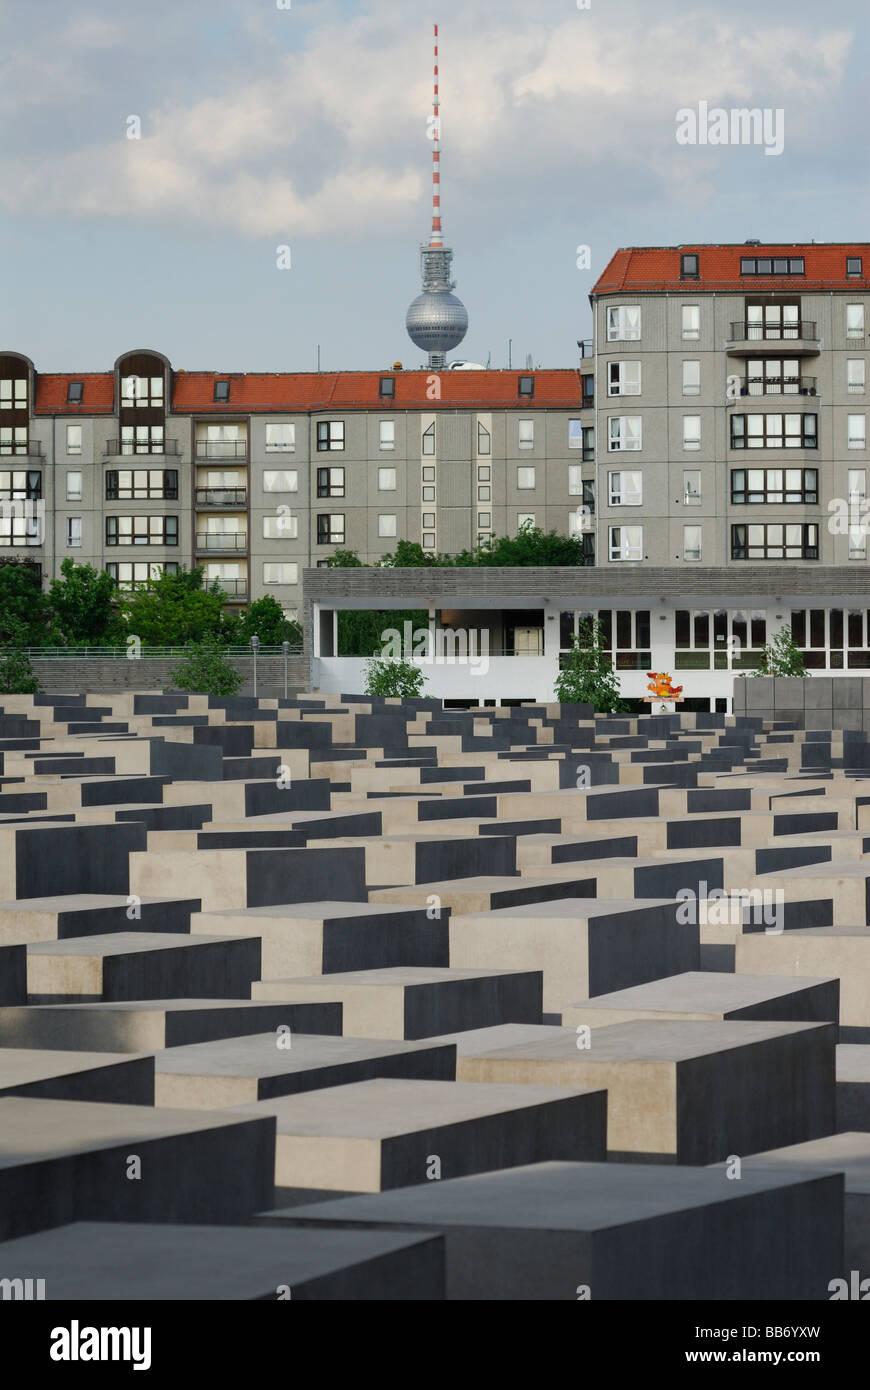 Berlin Germany Memorial to the Murdered Jews of Europe aka Holocaust Memorial Fernsehturm TV tower in background Stock Photo